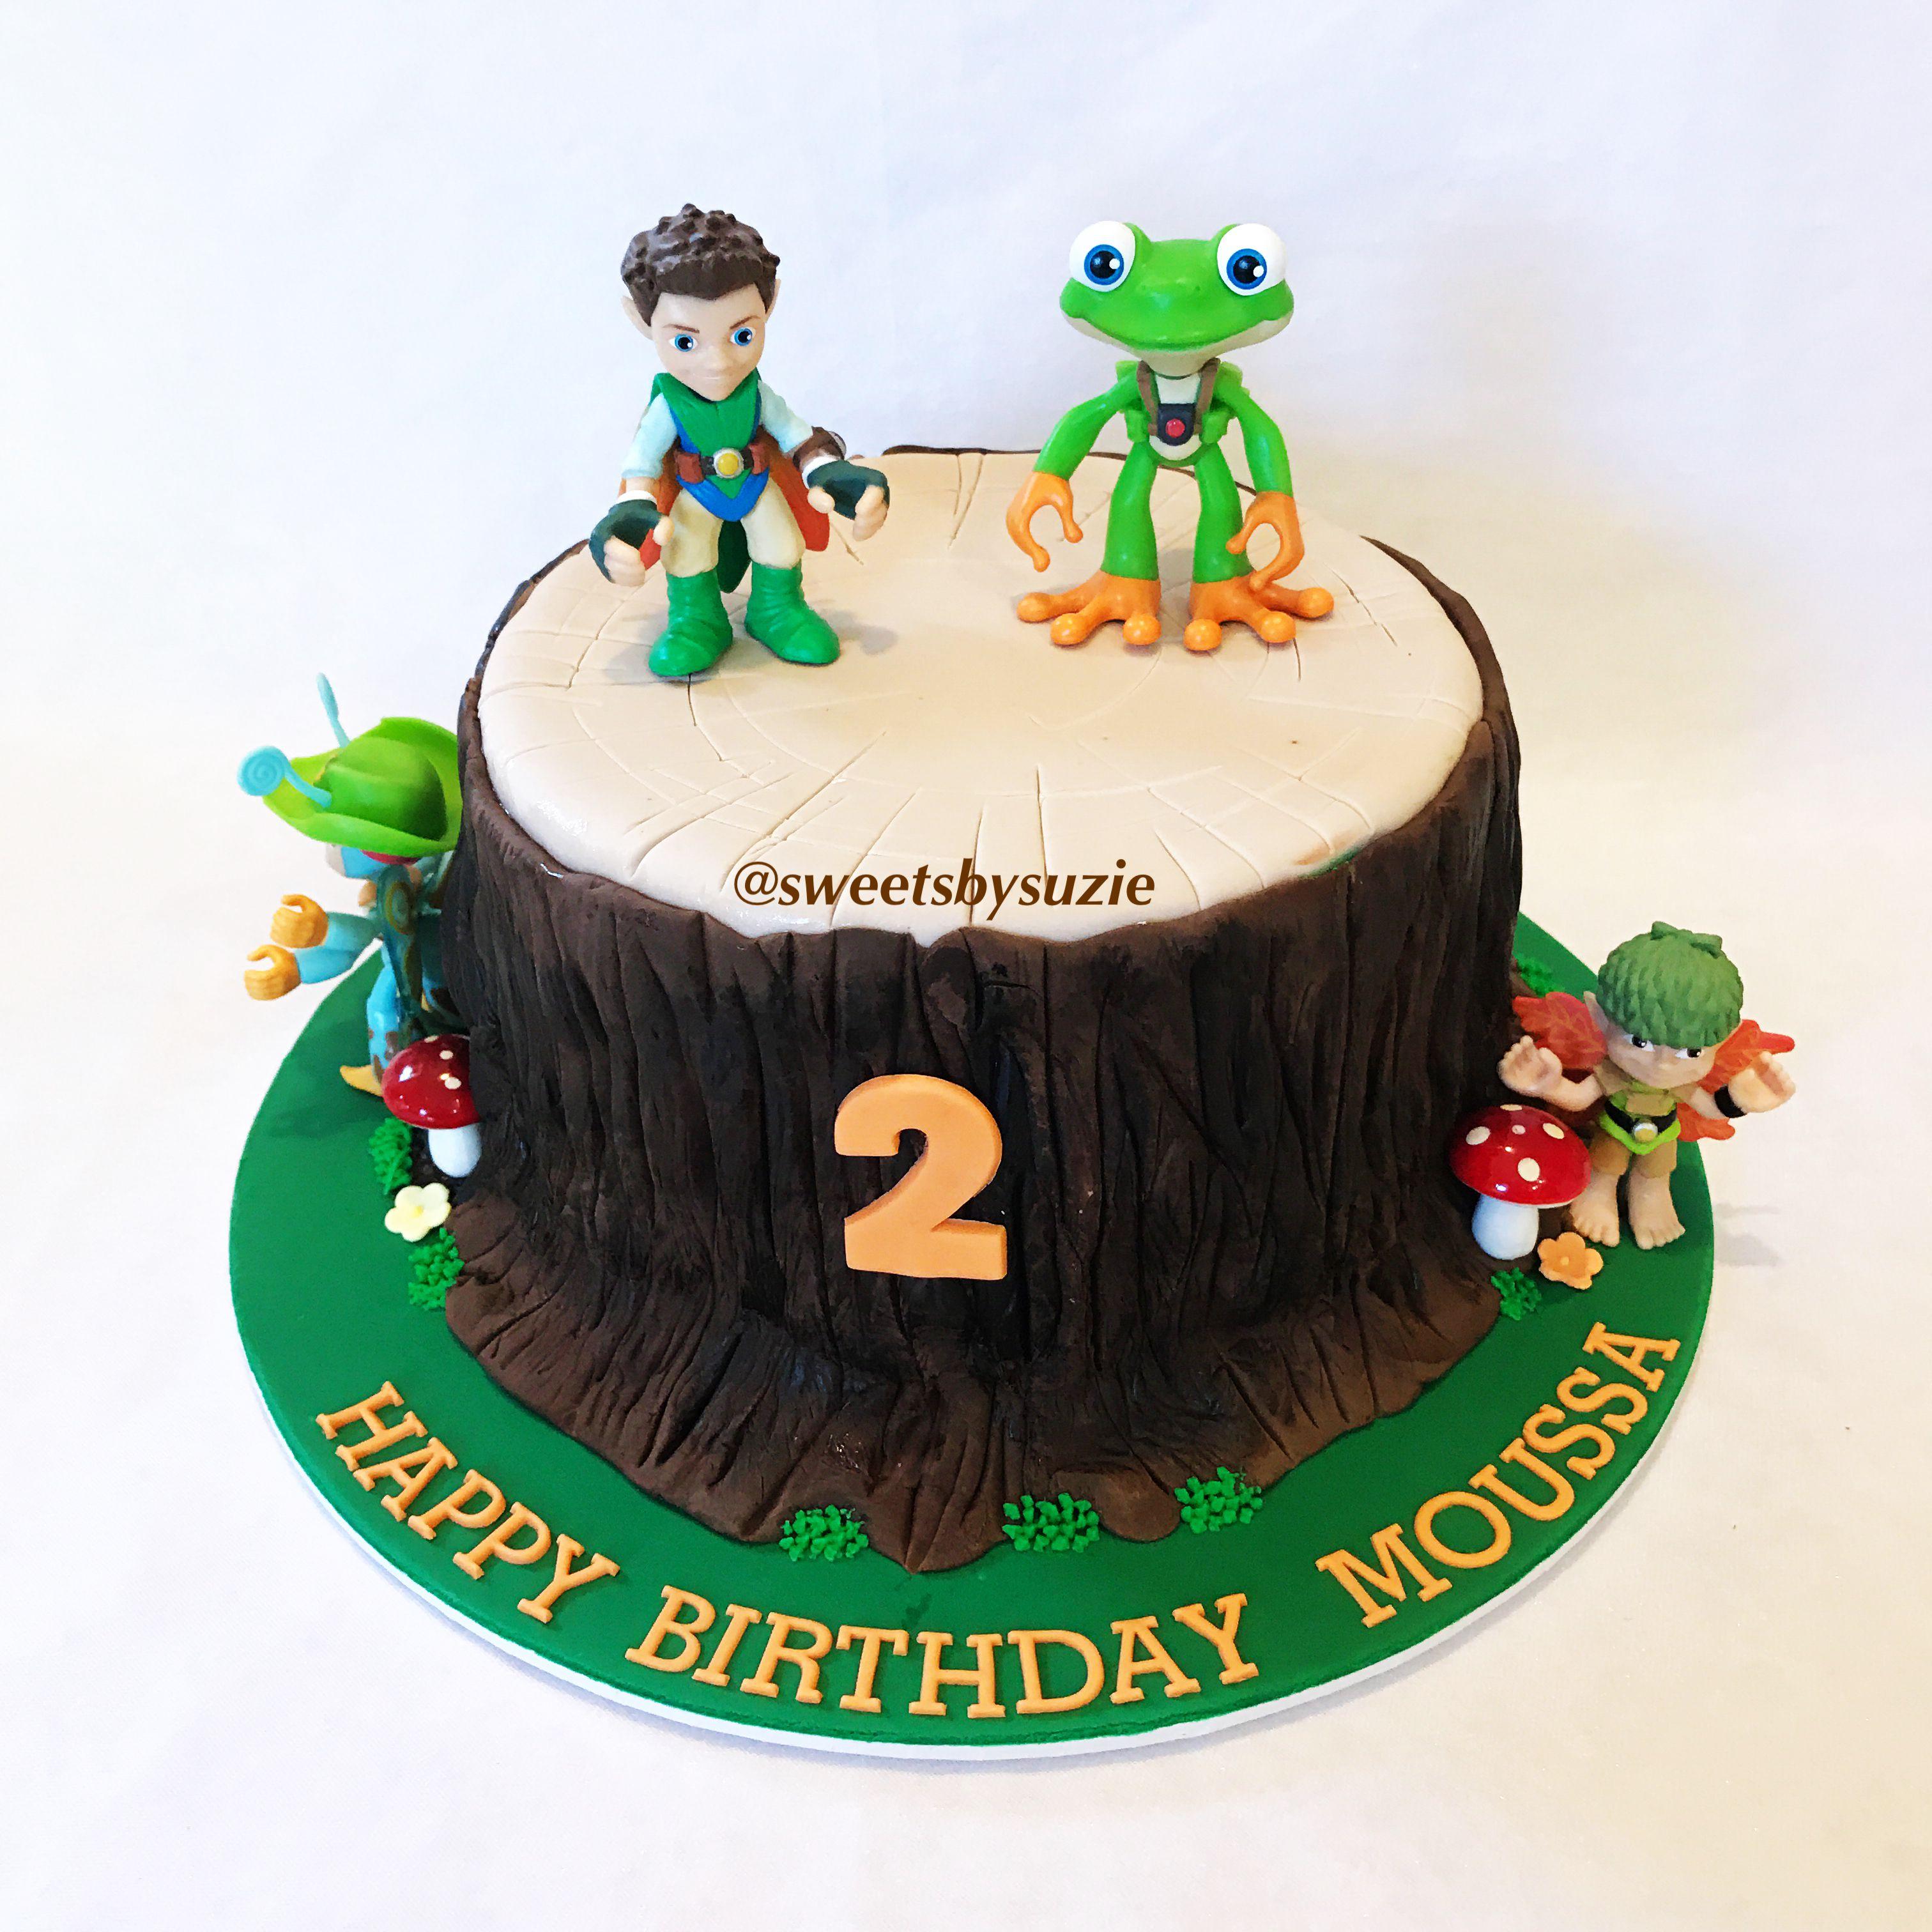 Tree Fu Tom Inspired Birthday Cake Made By Sweetsbysuzie In